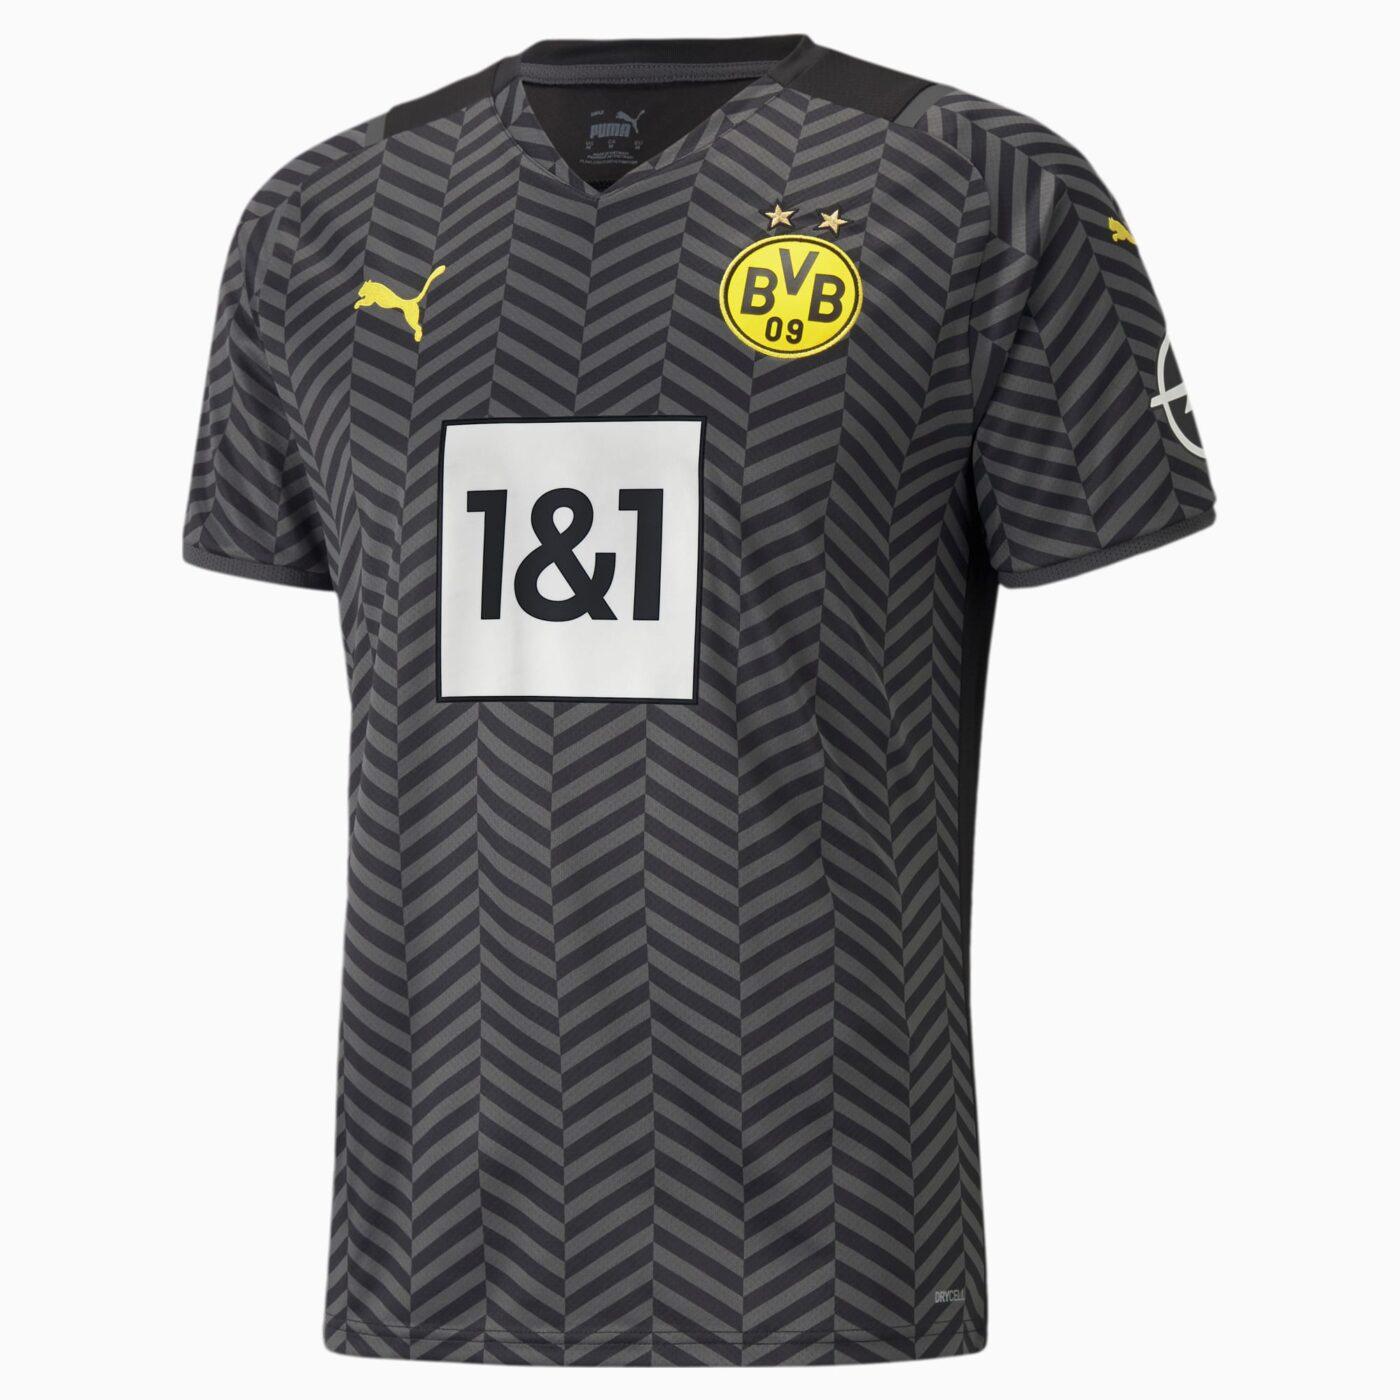 Maillot Borussia Dortmund 2021-2022 exterieur PUMA